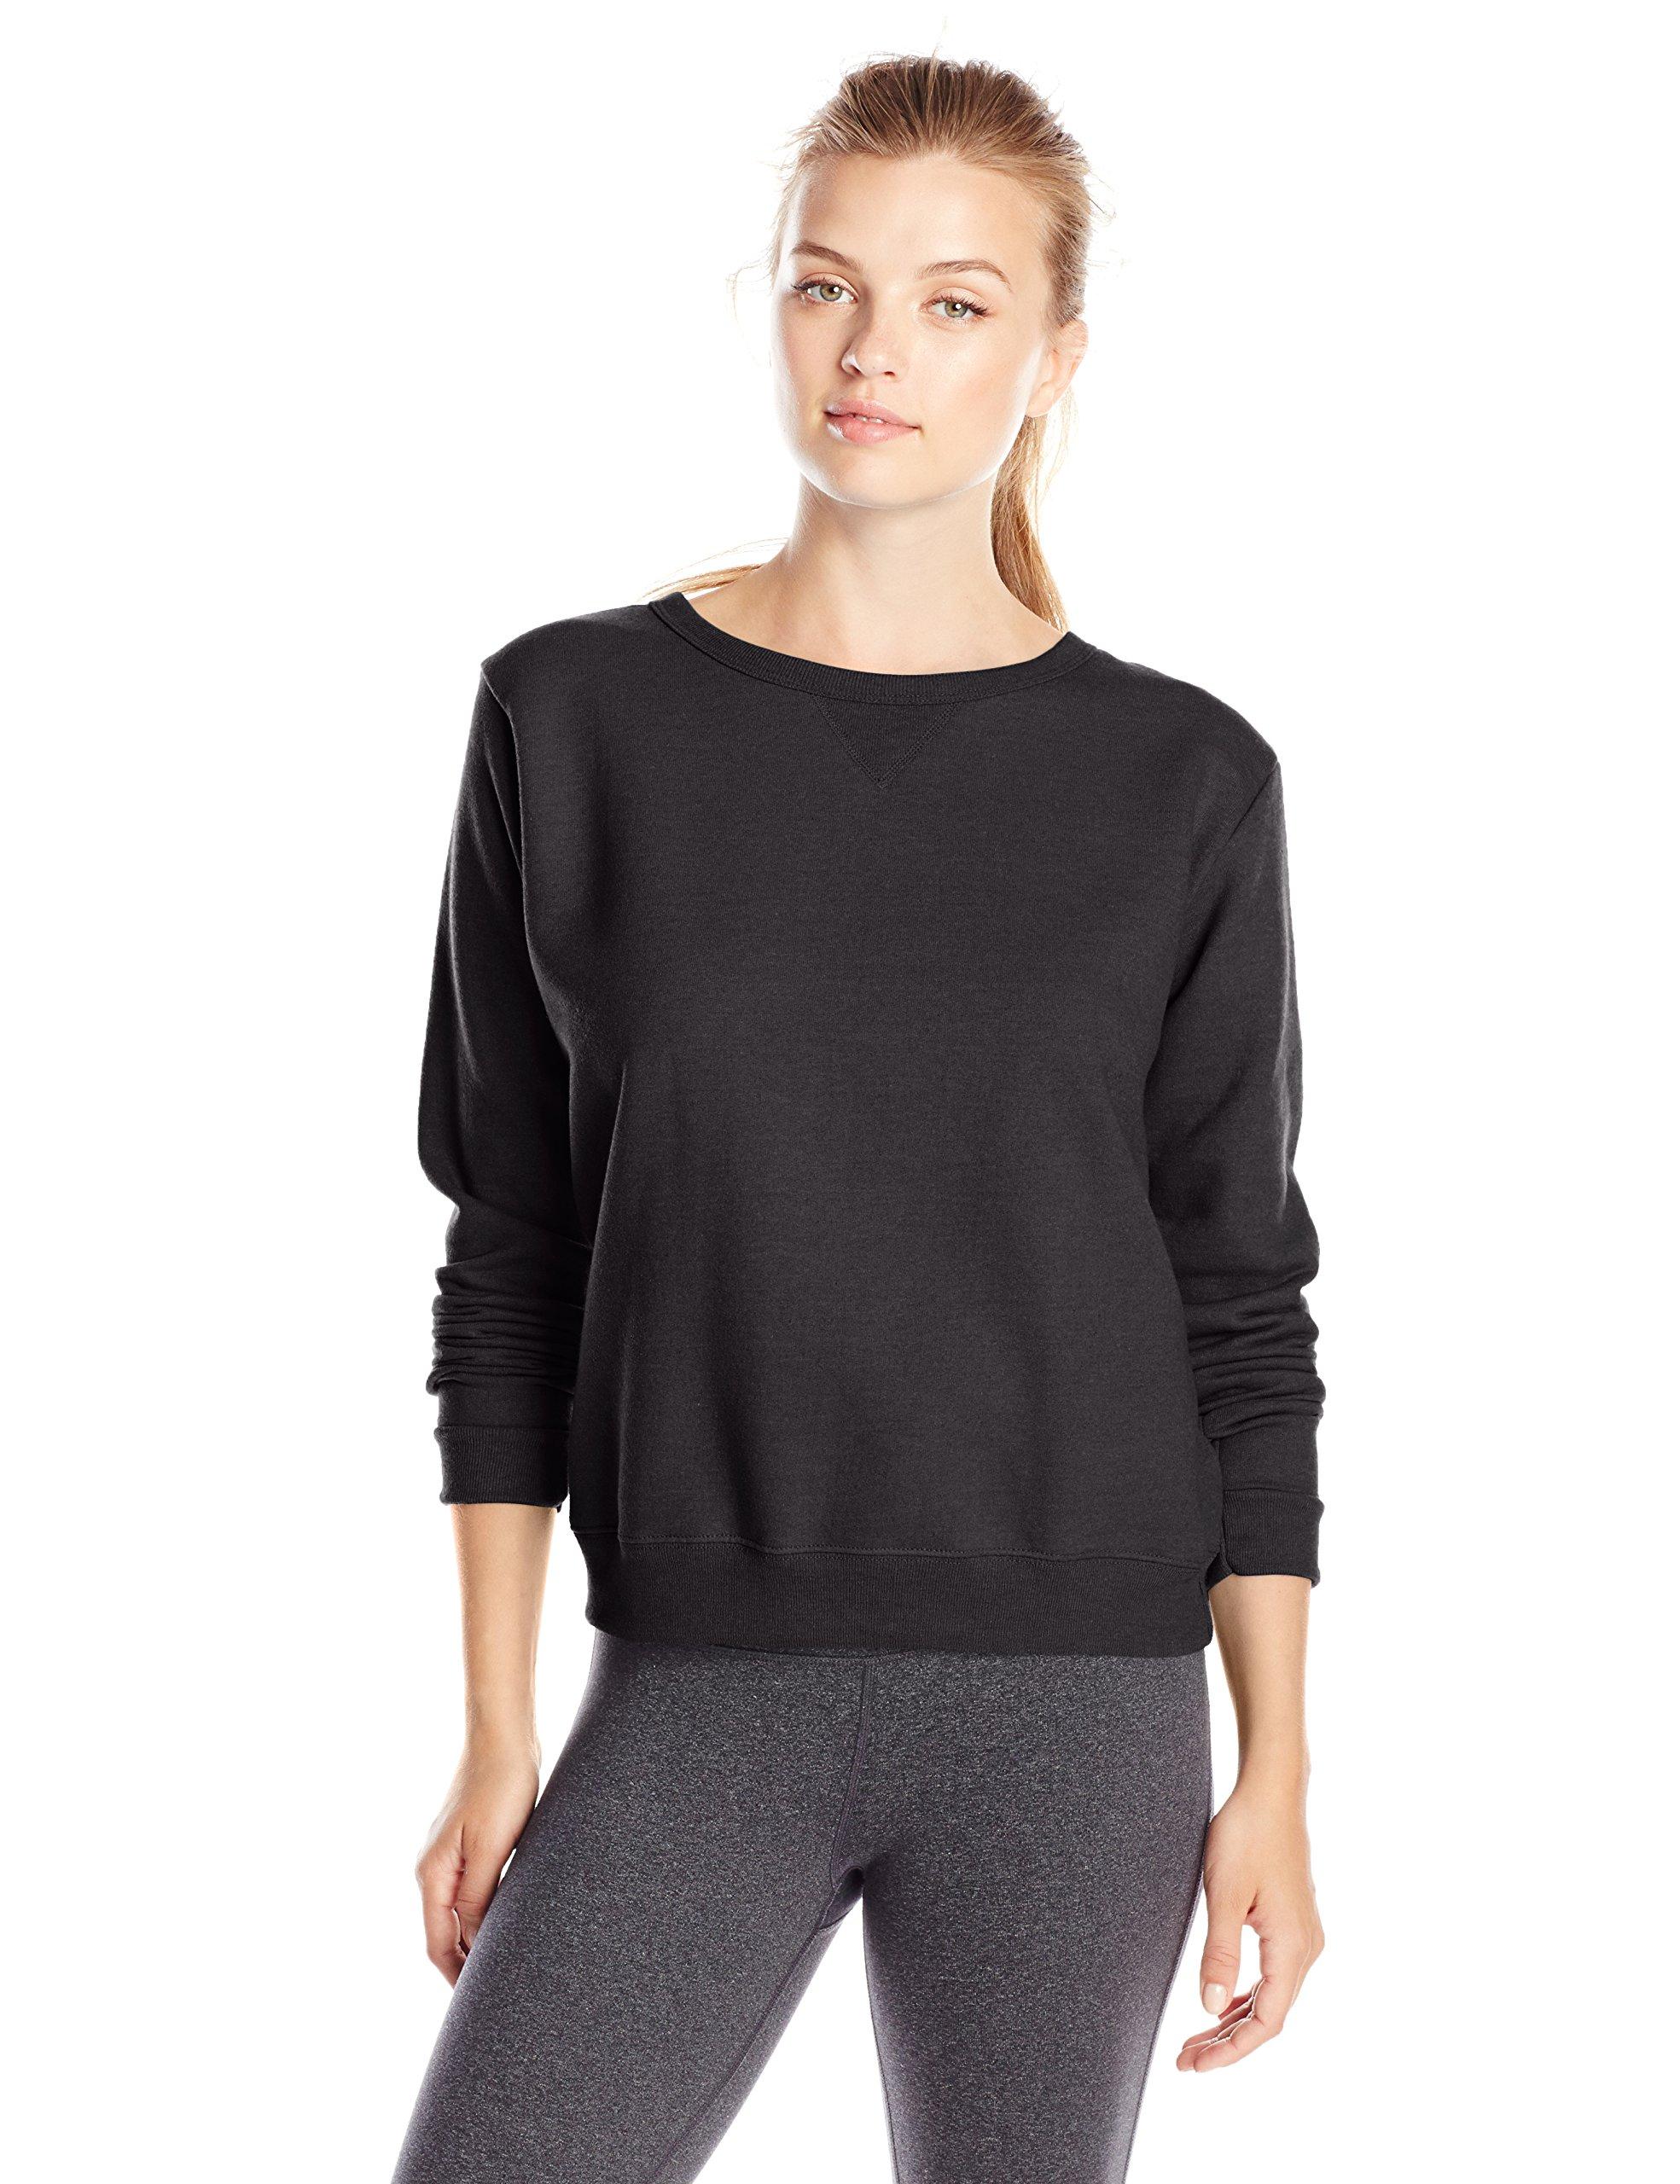 Hanes Women's V-Notch Pullover Fleece Sweatshirt, Ebony, Small